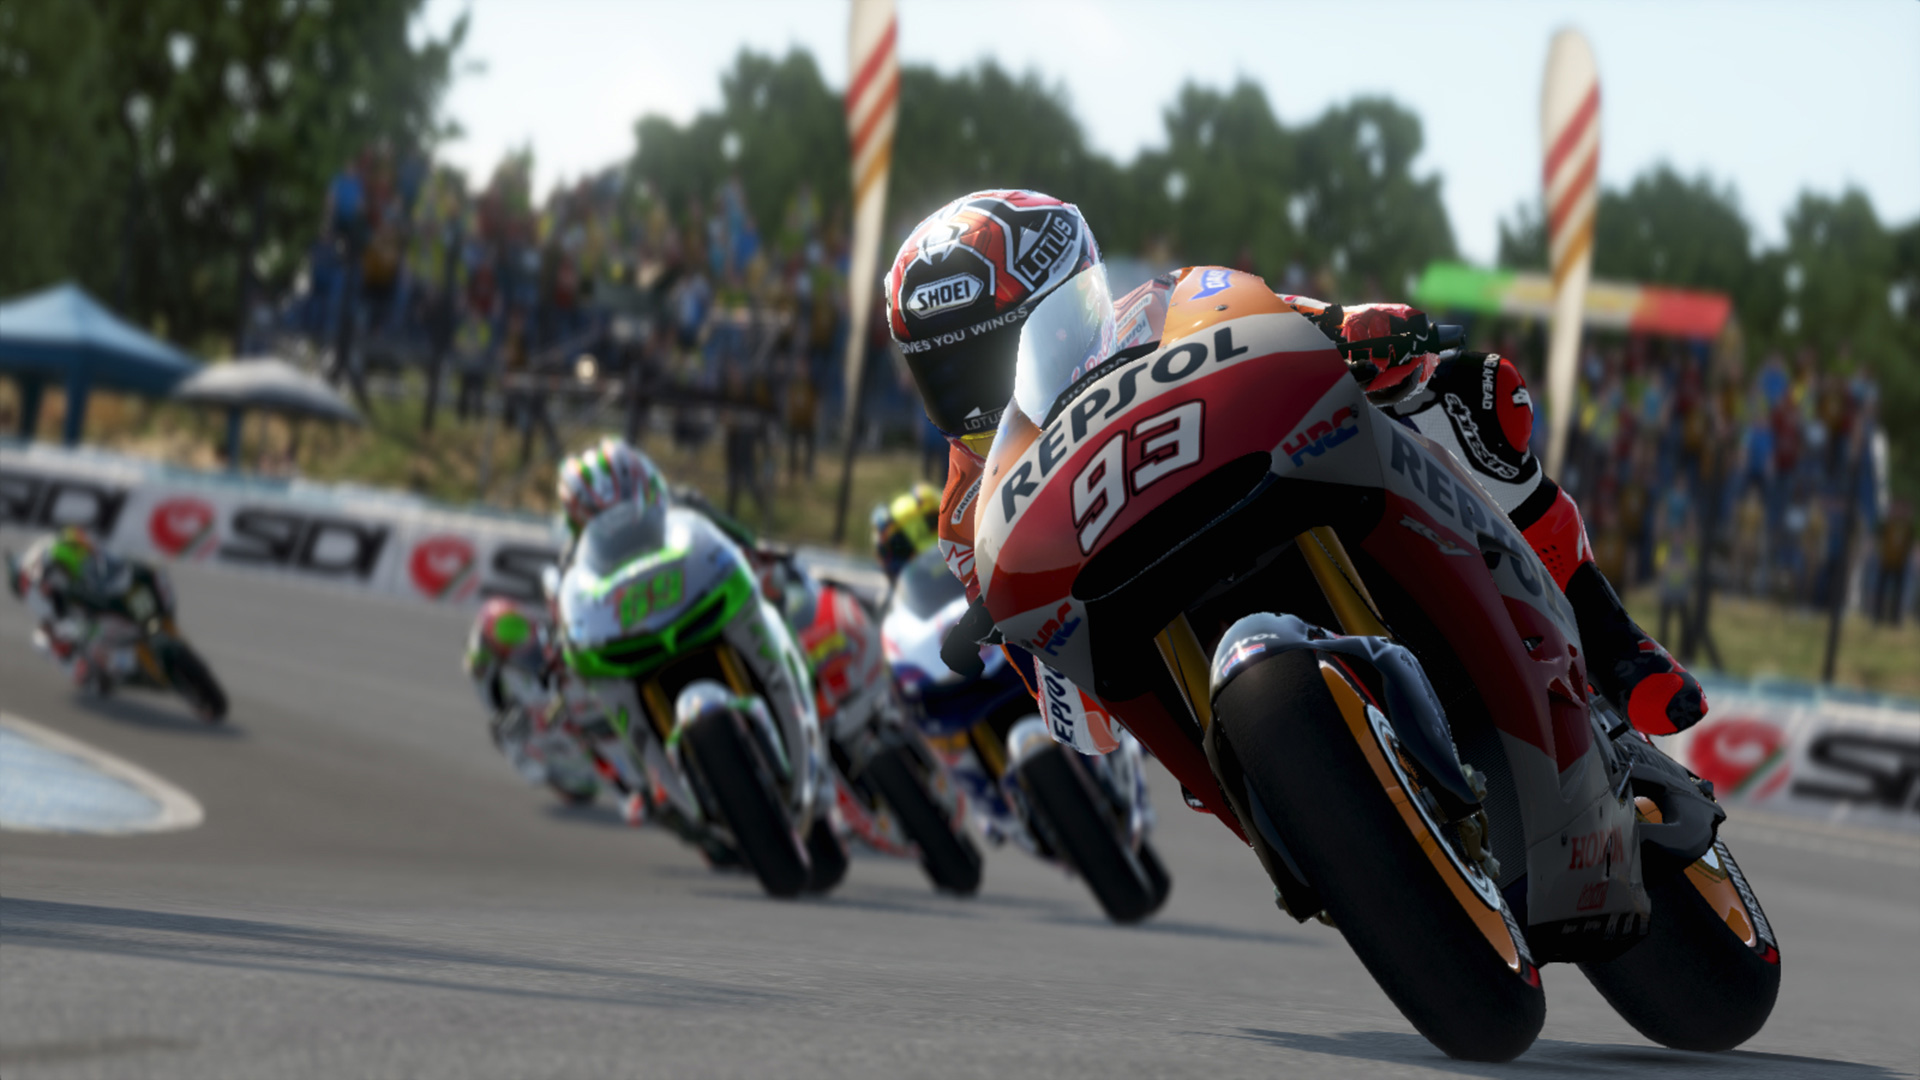 MotoGP14 Compact screenshot